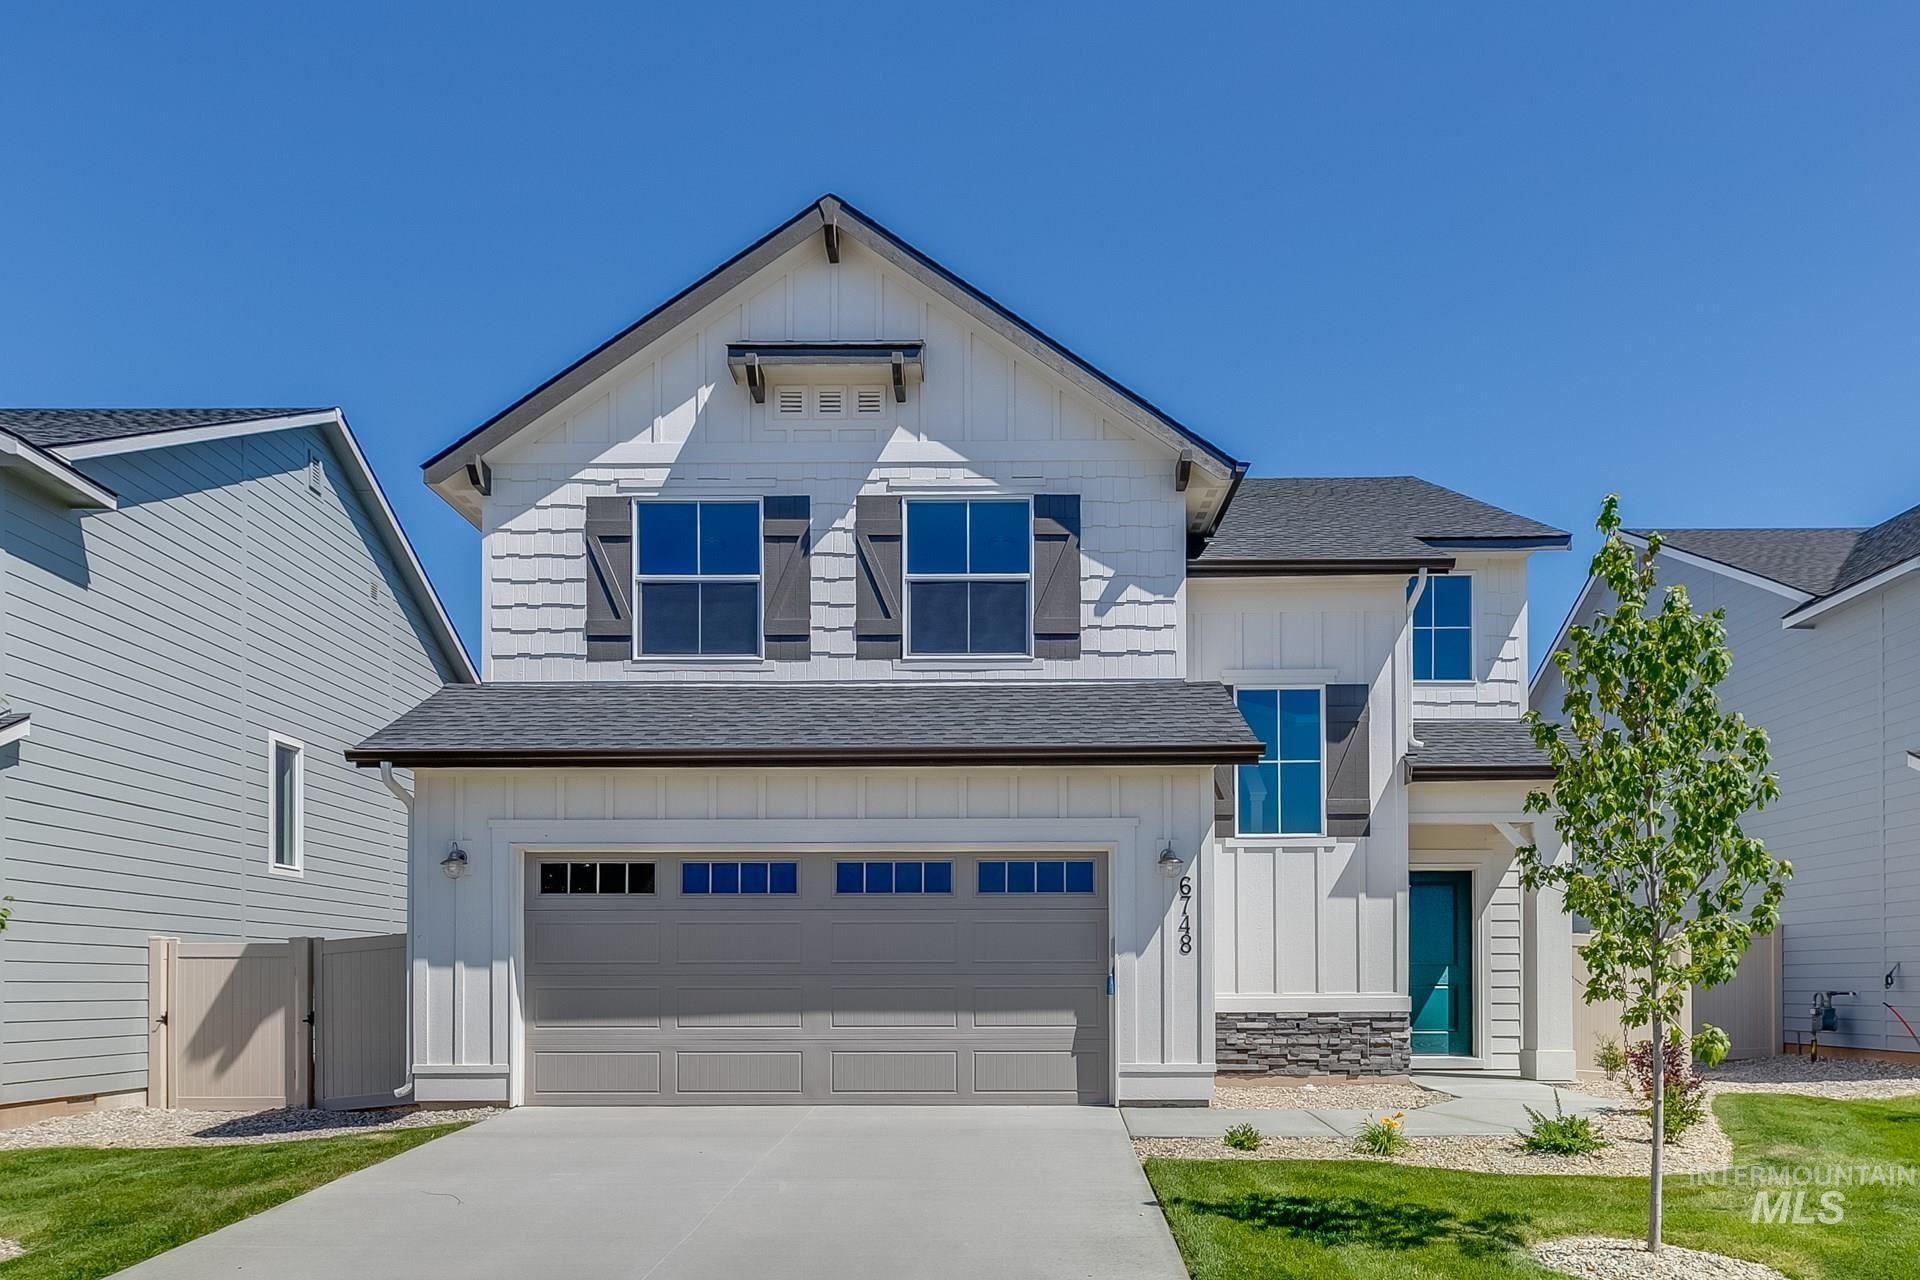 Photo of 6748 E Zaffre Ridge St, Boise, ID 83716 (MLS # 98768619)